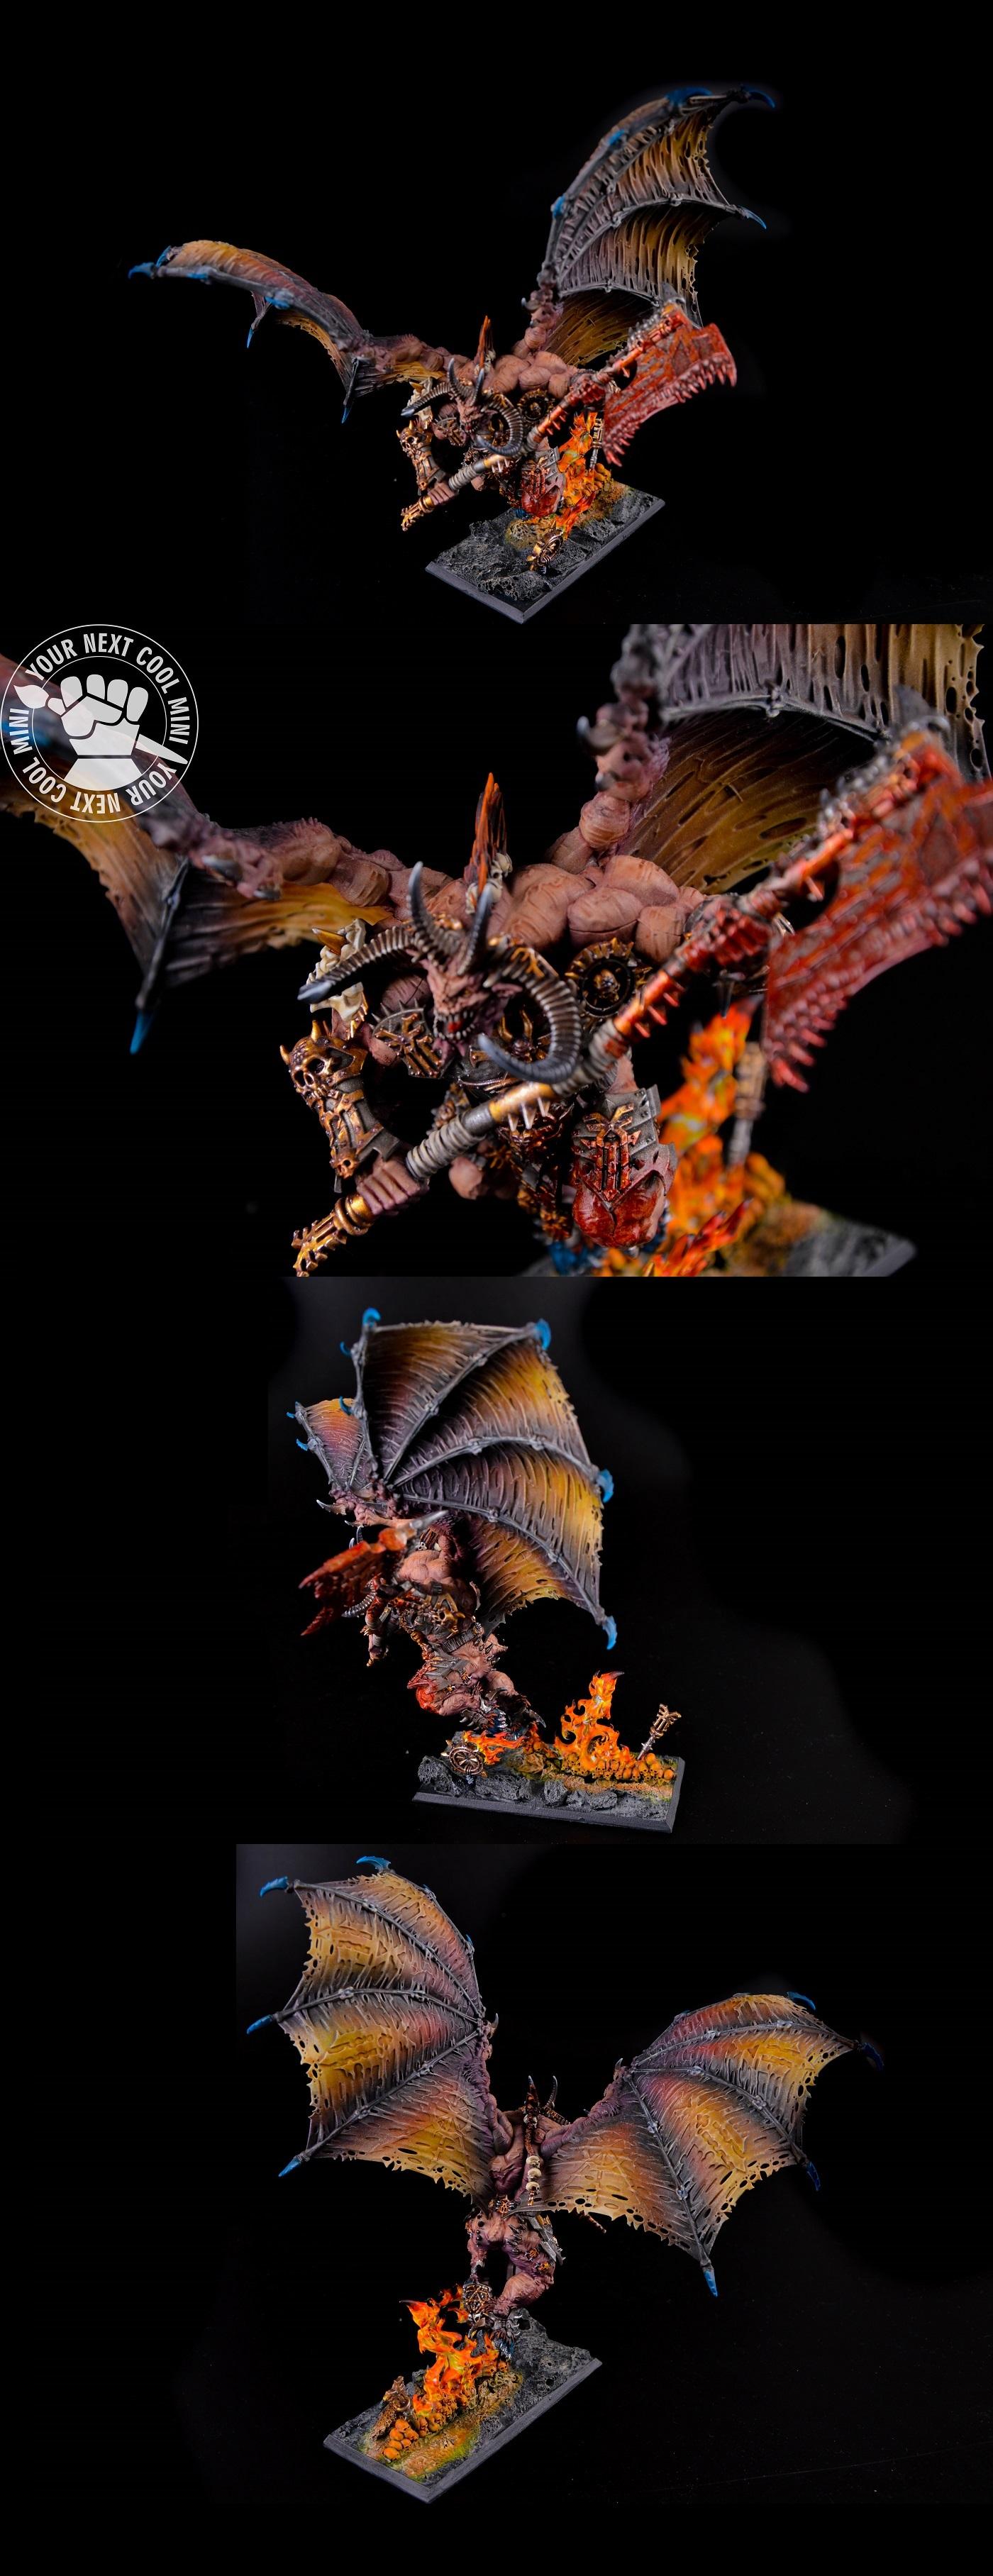 Warhammer AoS Daemons Of Khorne Bloodthirster